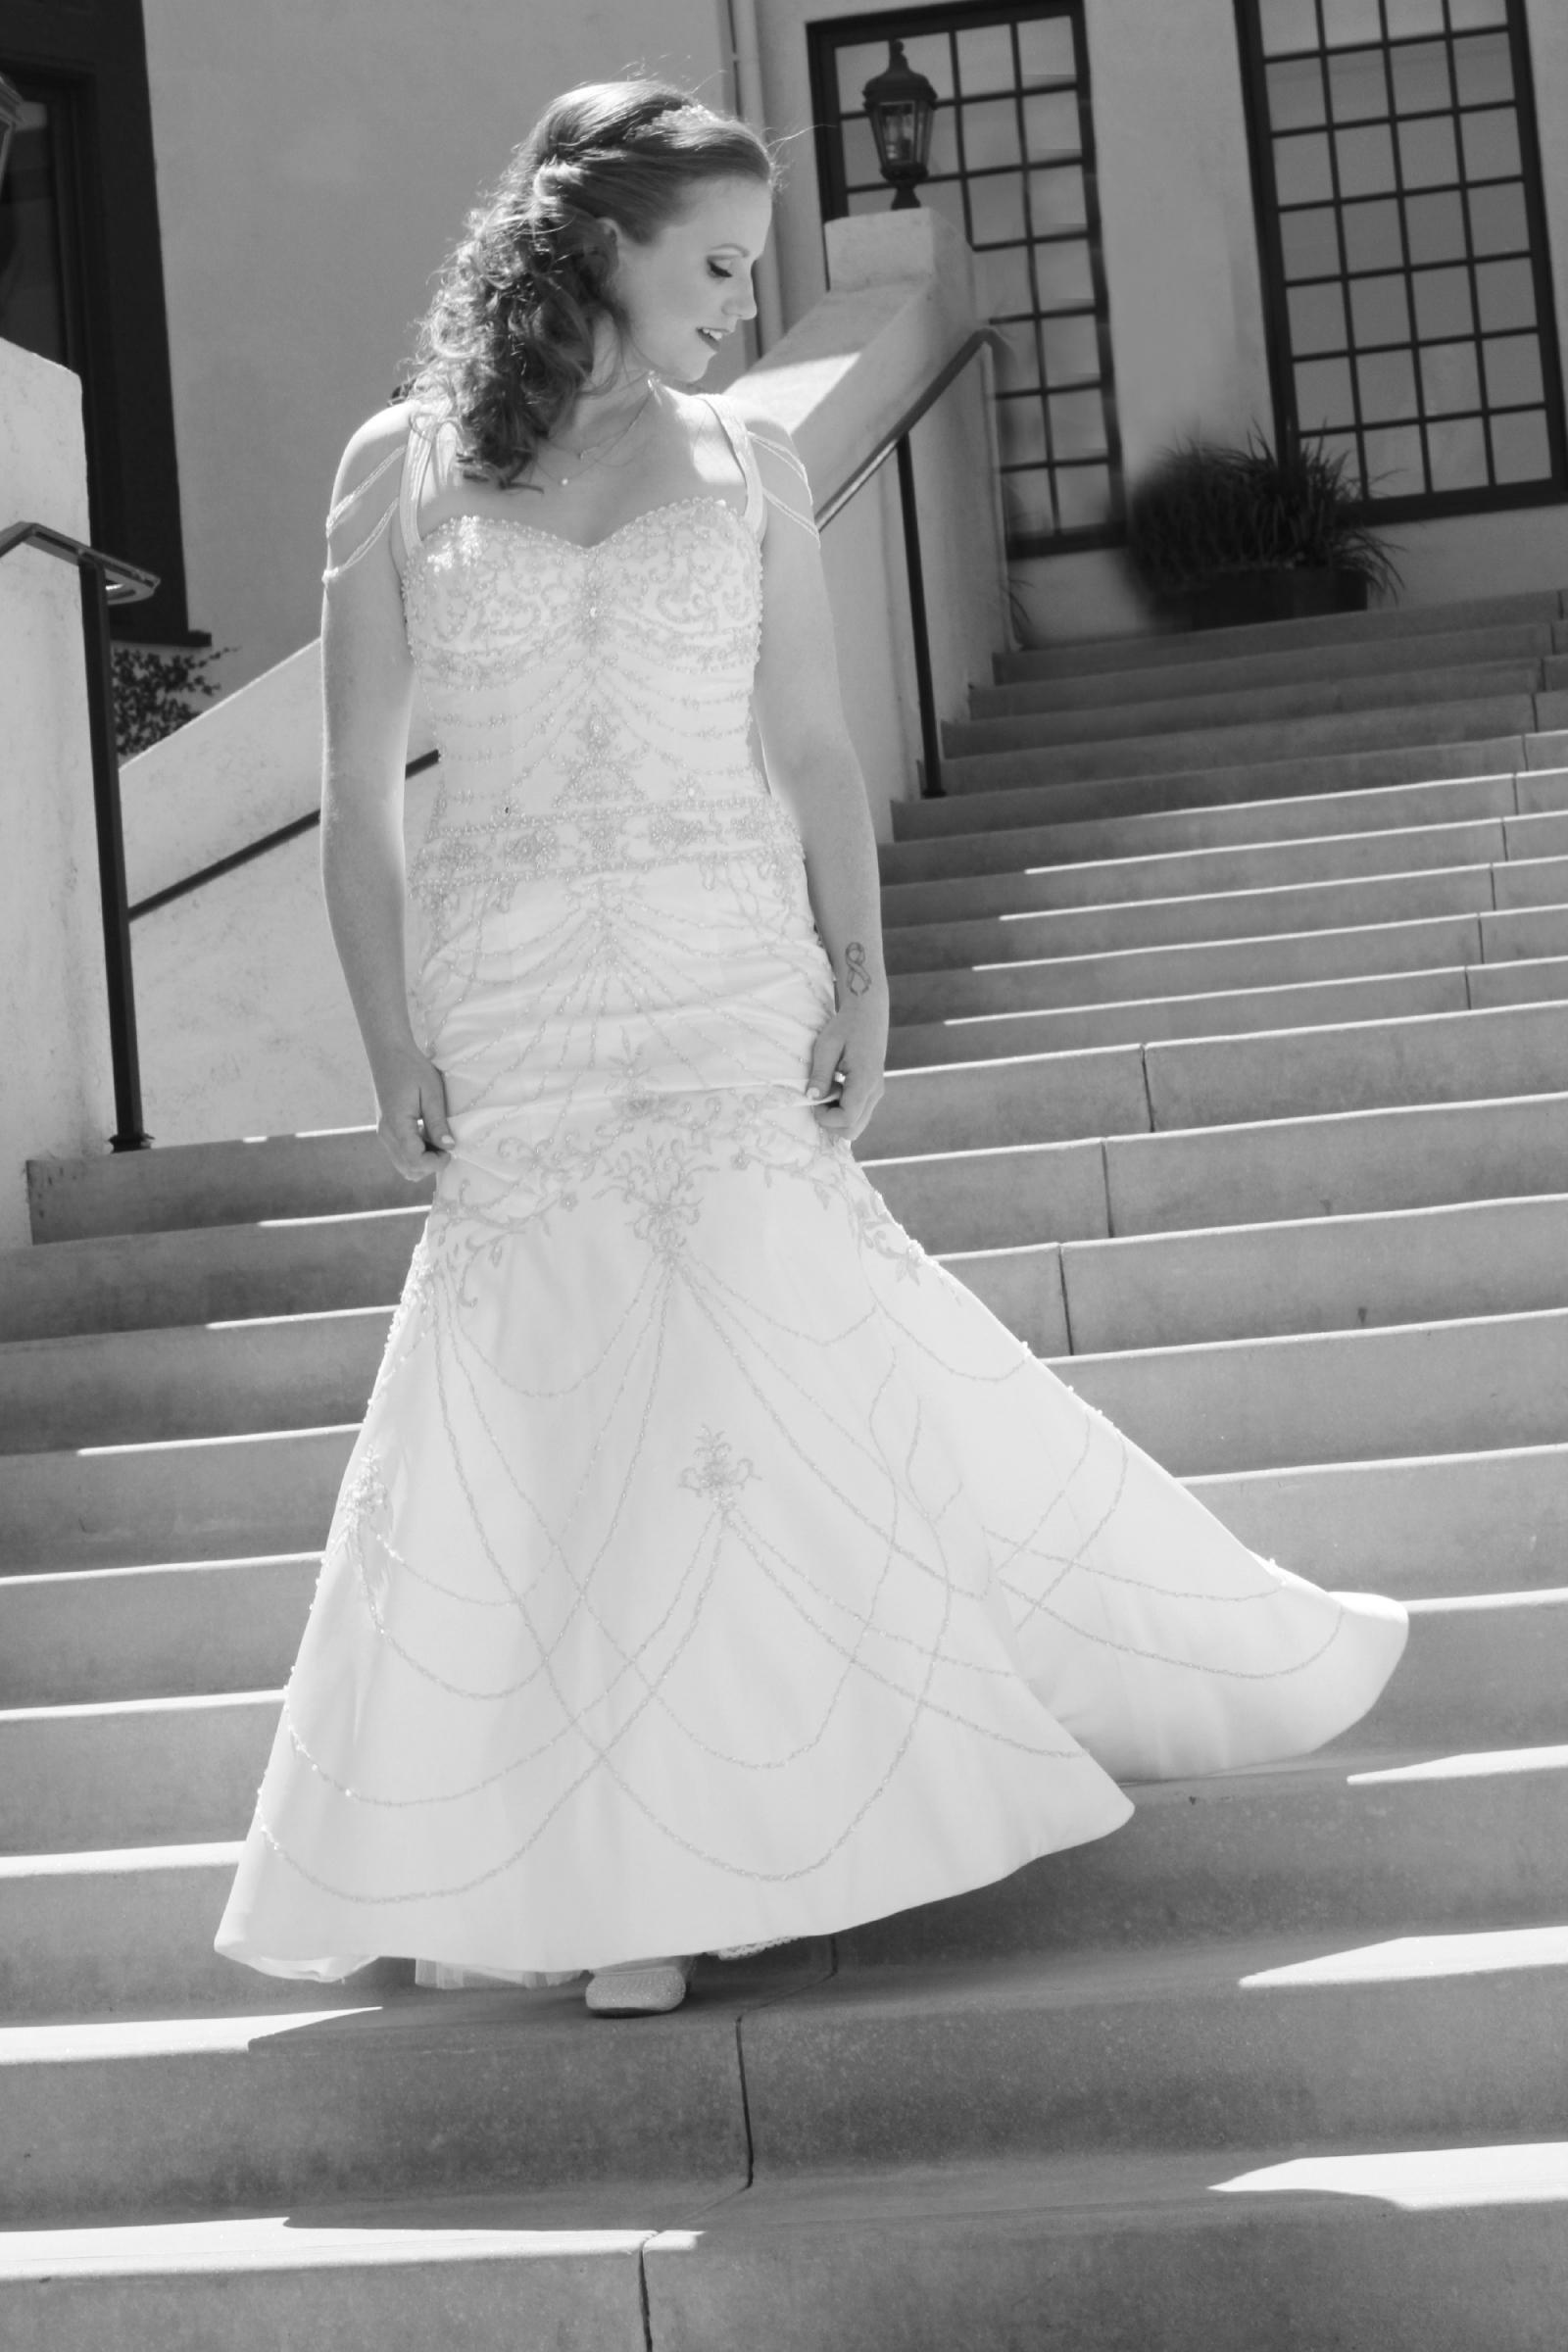 ad8450abdc David s Bridal Preloved Wedding Dress on Sale 67% Off - Stillwhite ...